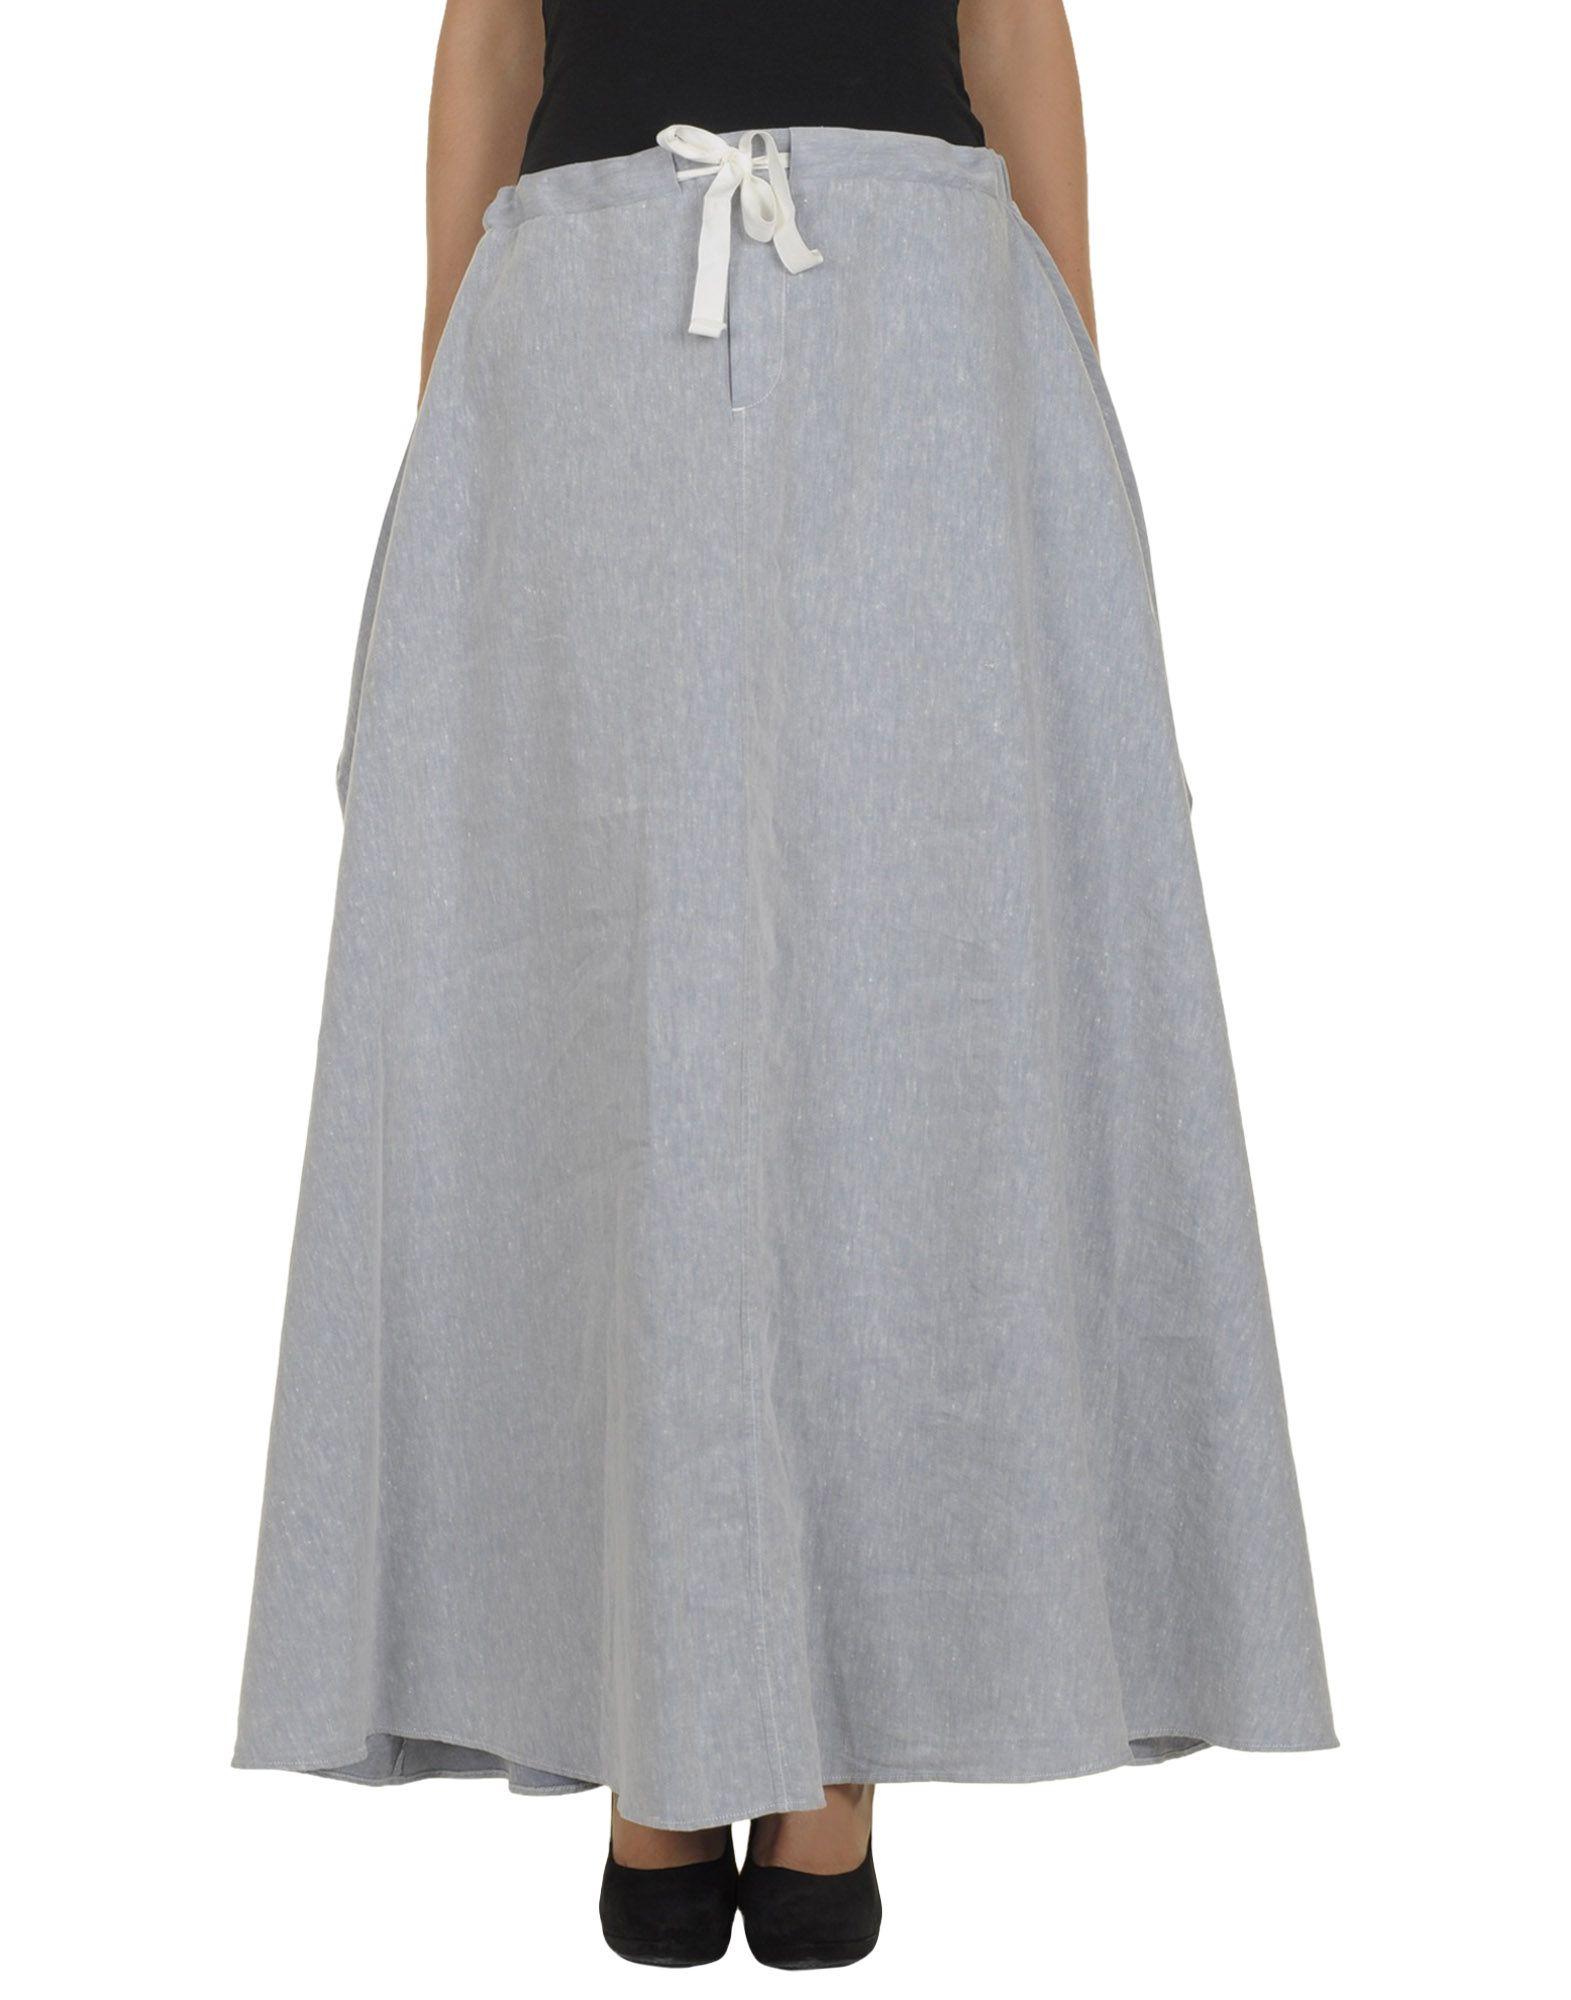 MM6 MAISON MARGIELA Длинная юбка simclan® длинная юбка